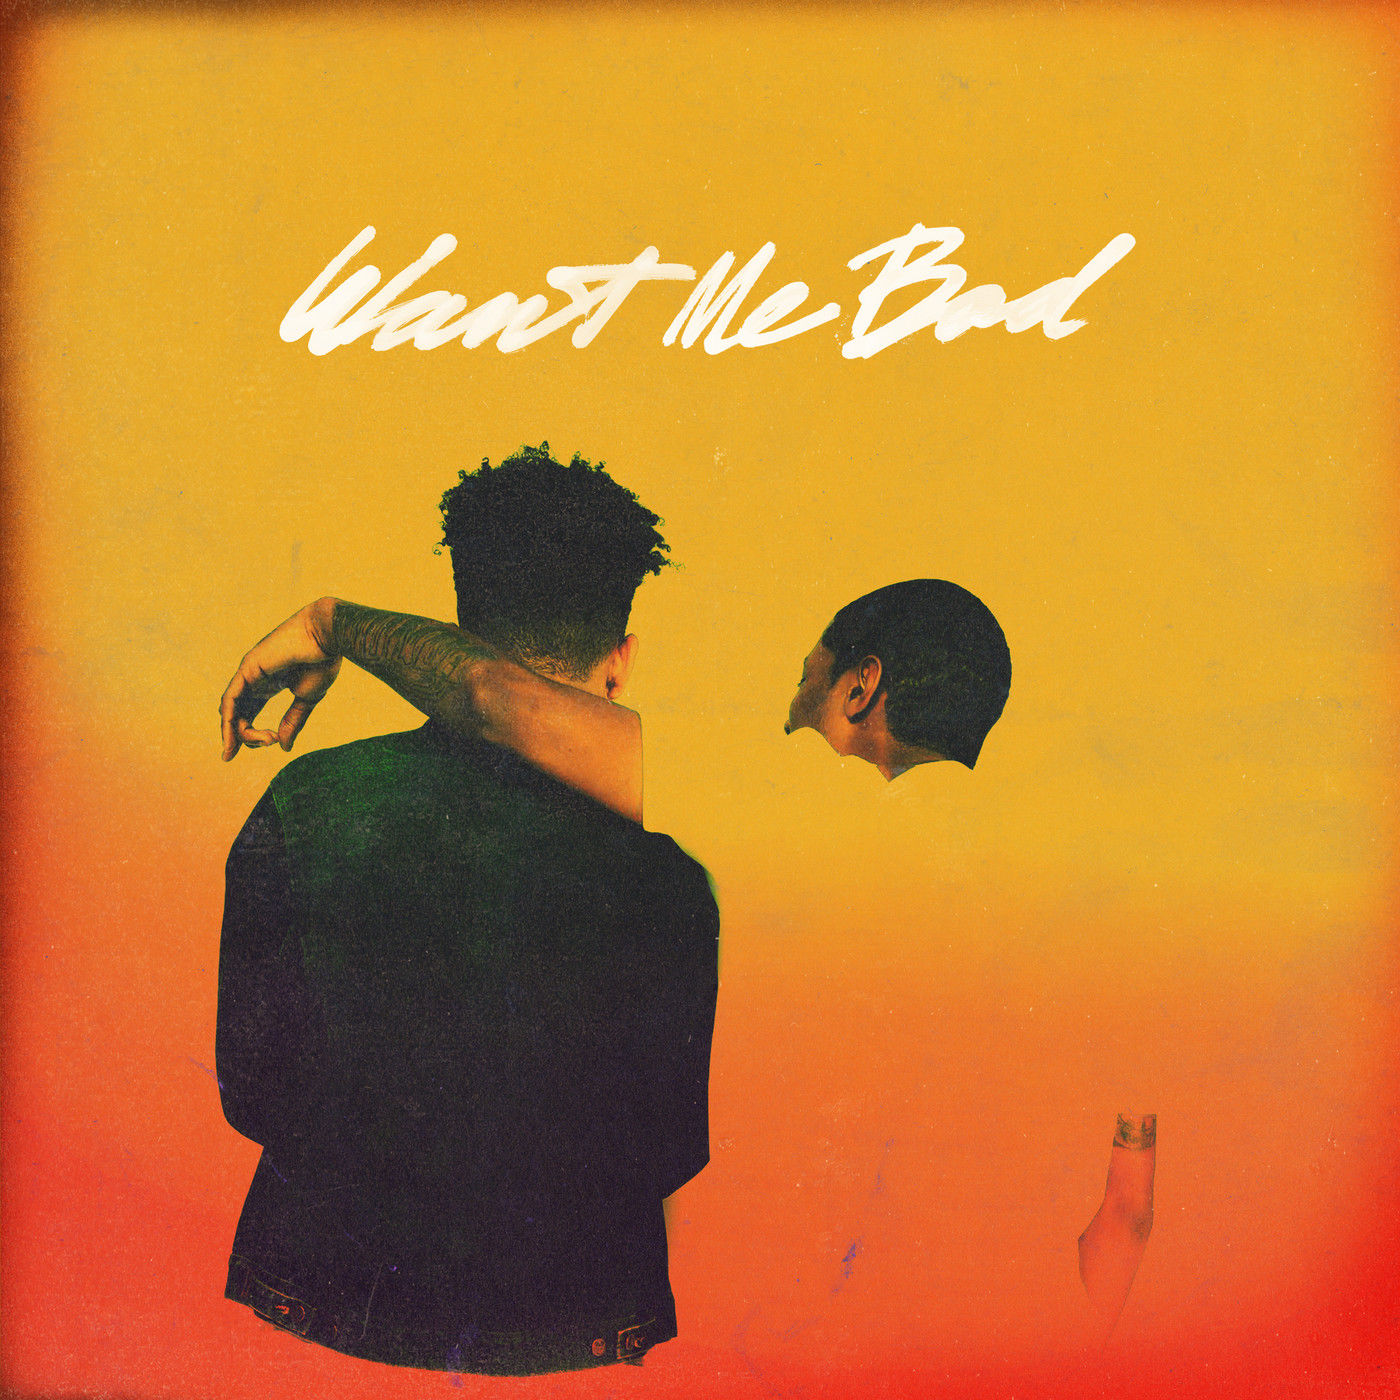 KYLE - Want Me Bad (feat. Cousin Stizz) - Single Cover